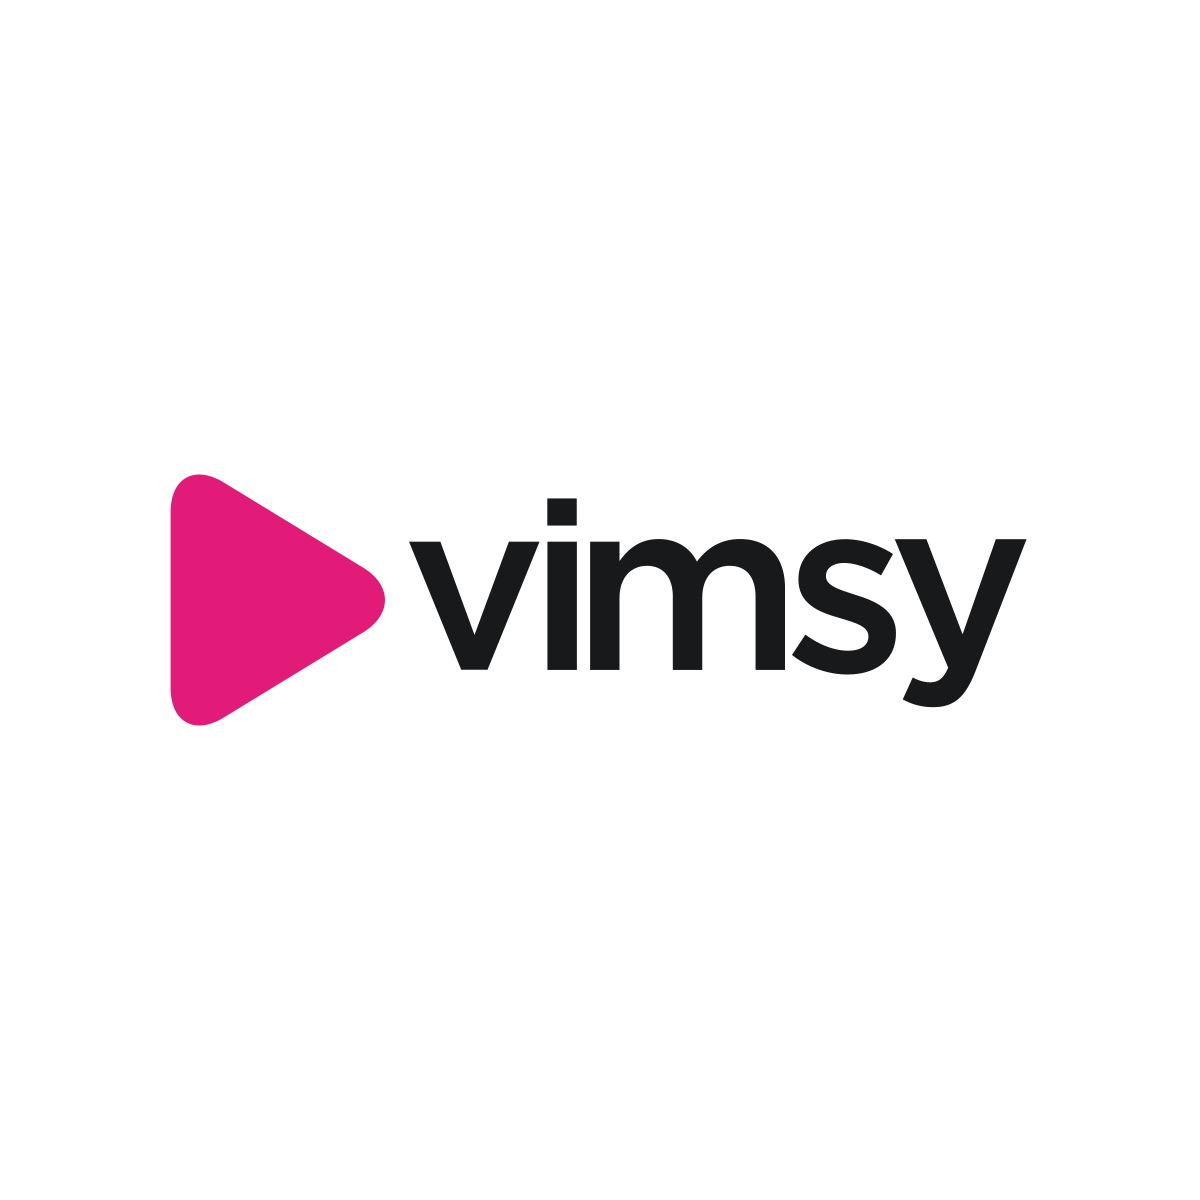 Vimsy logo